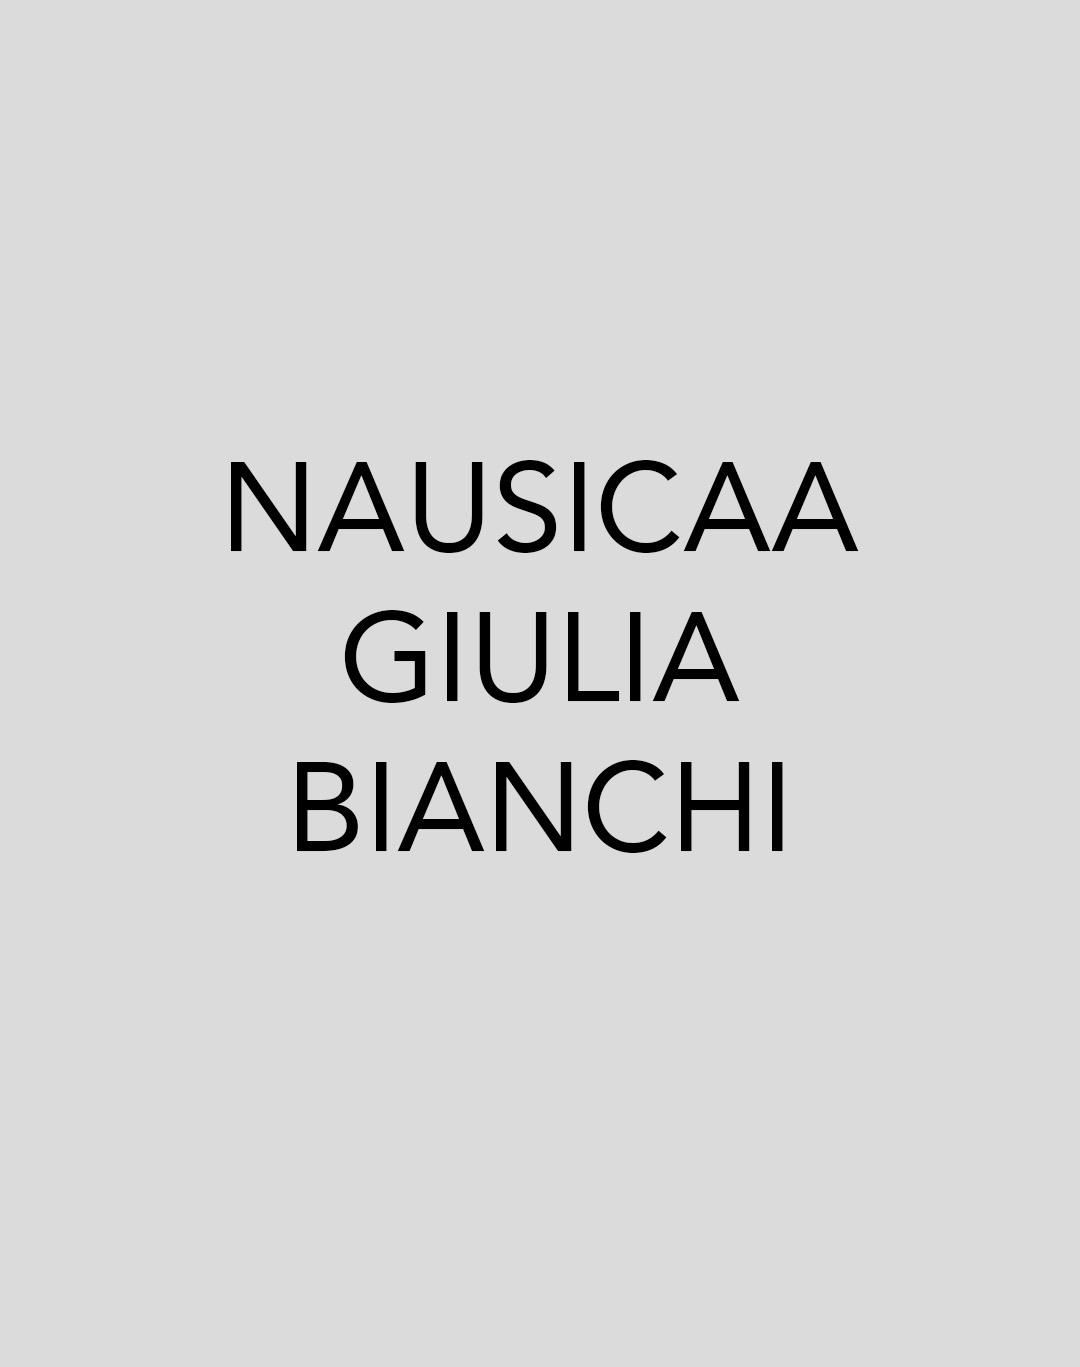 gbianchi